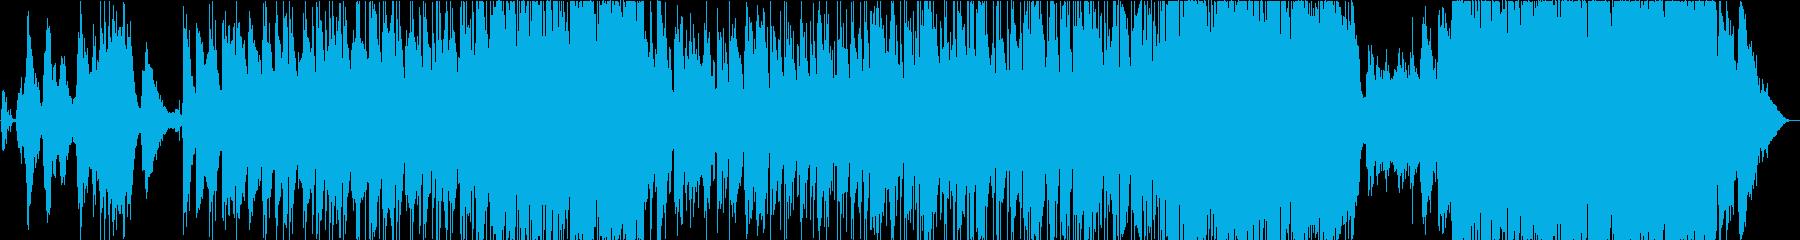 Briseの再生済みの波形